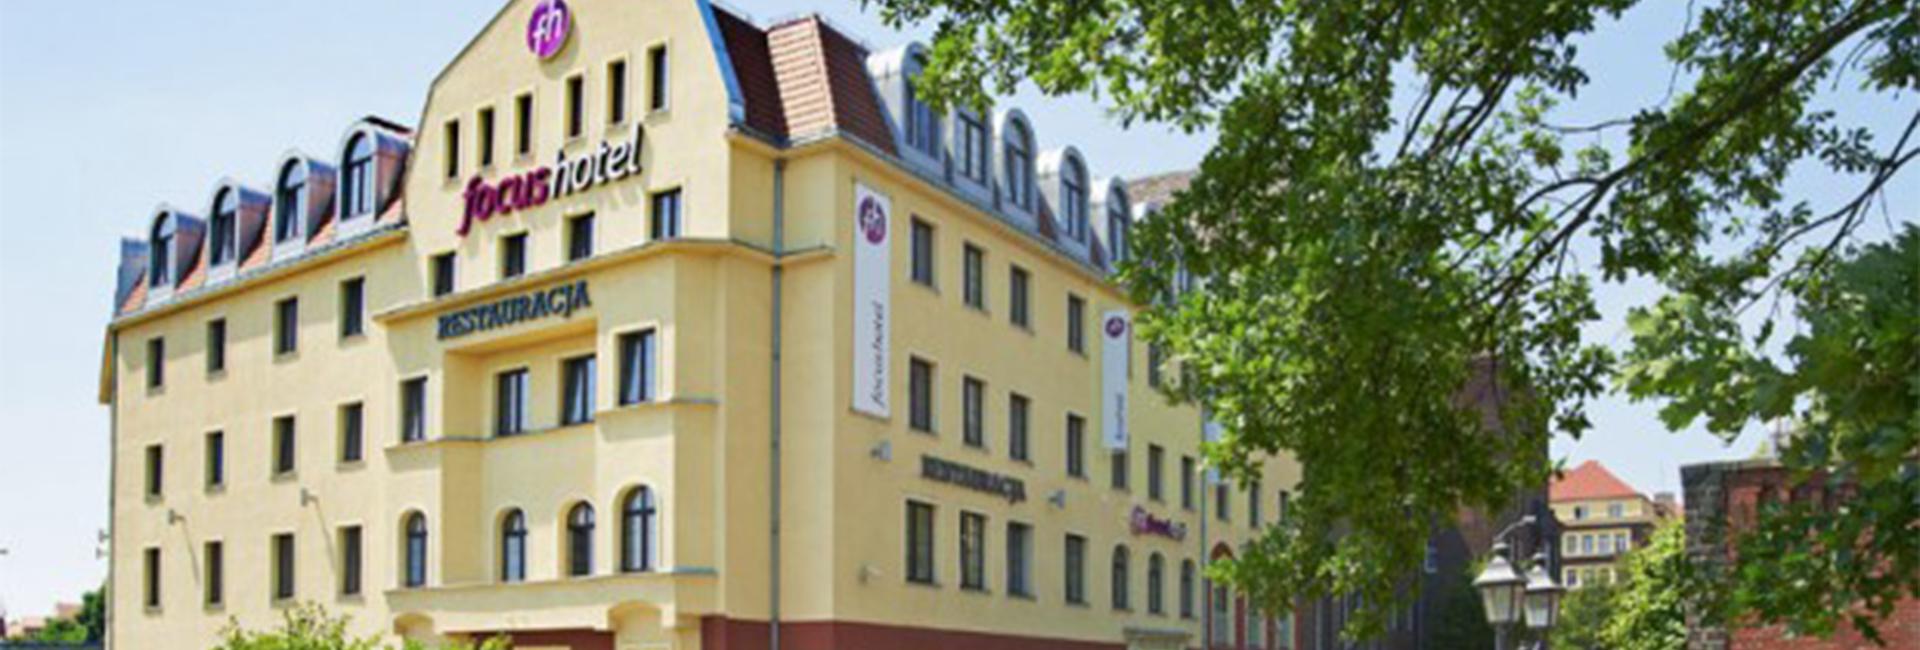 Stettin - Hotel Focus 3 dage